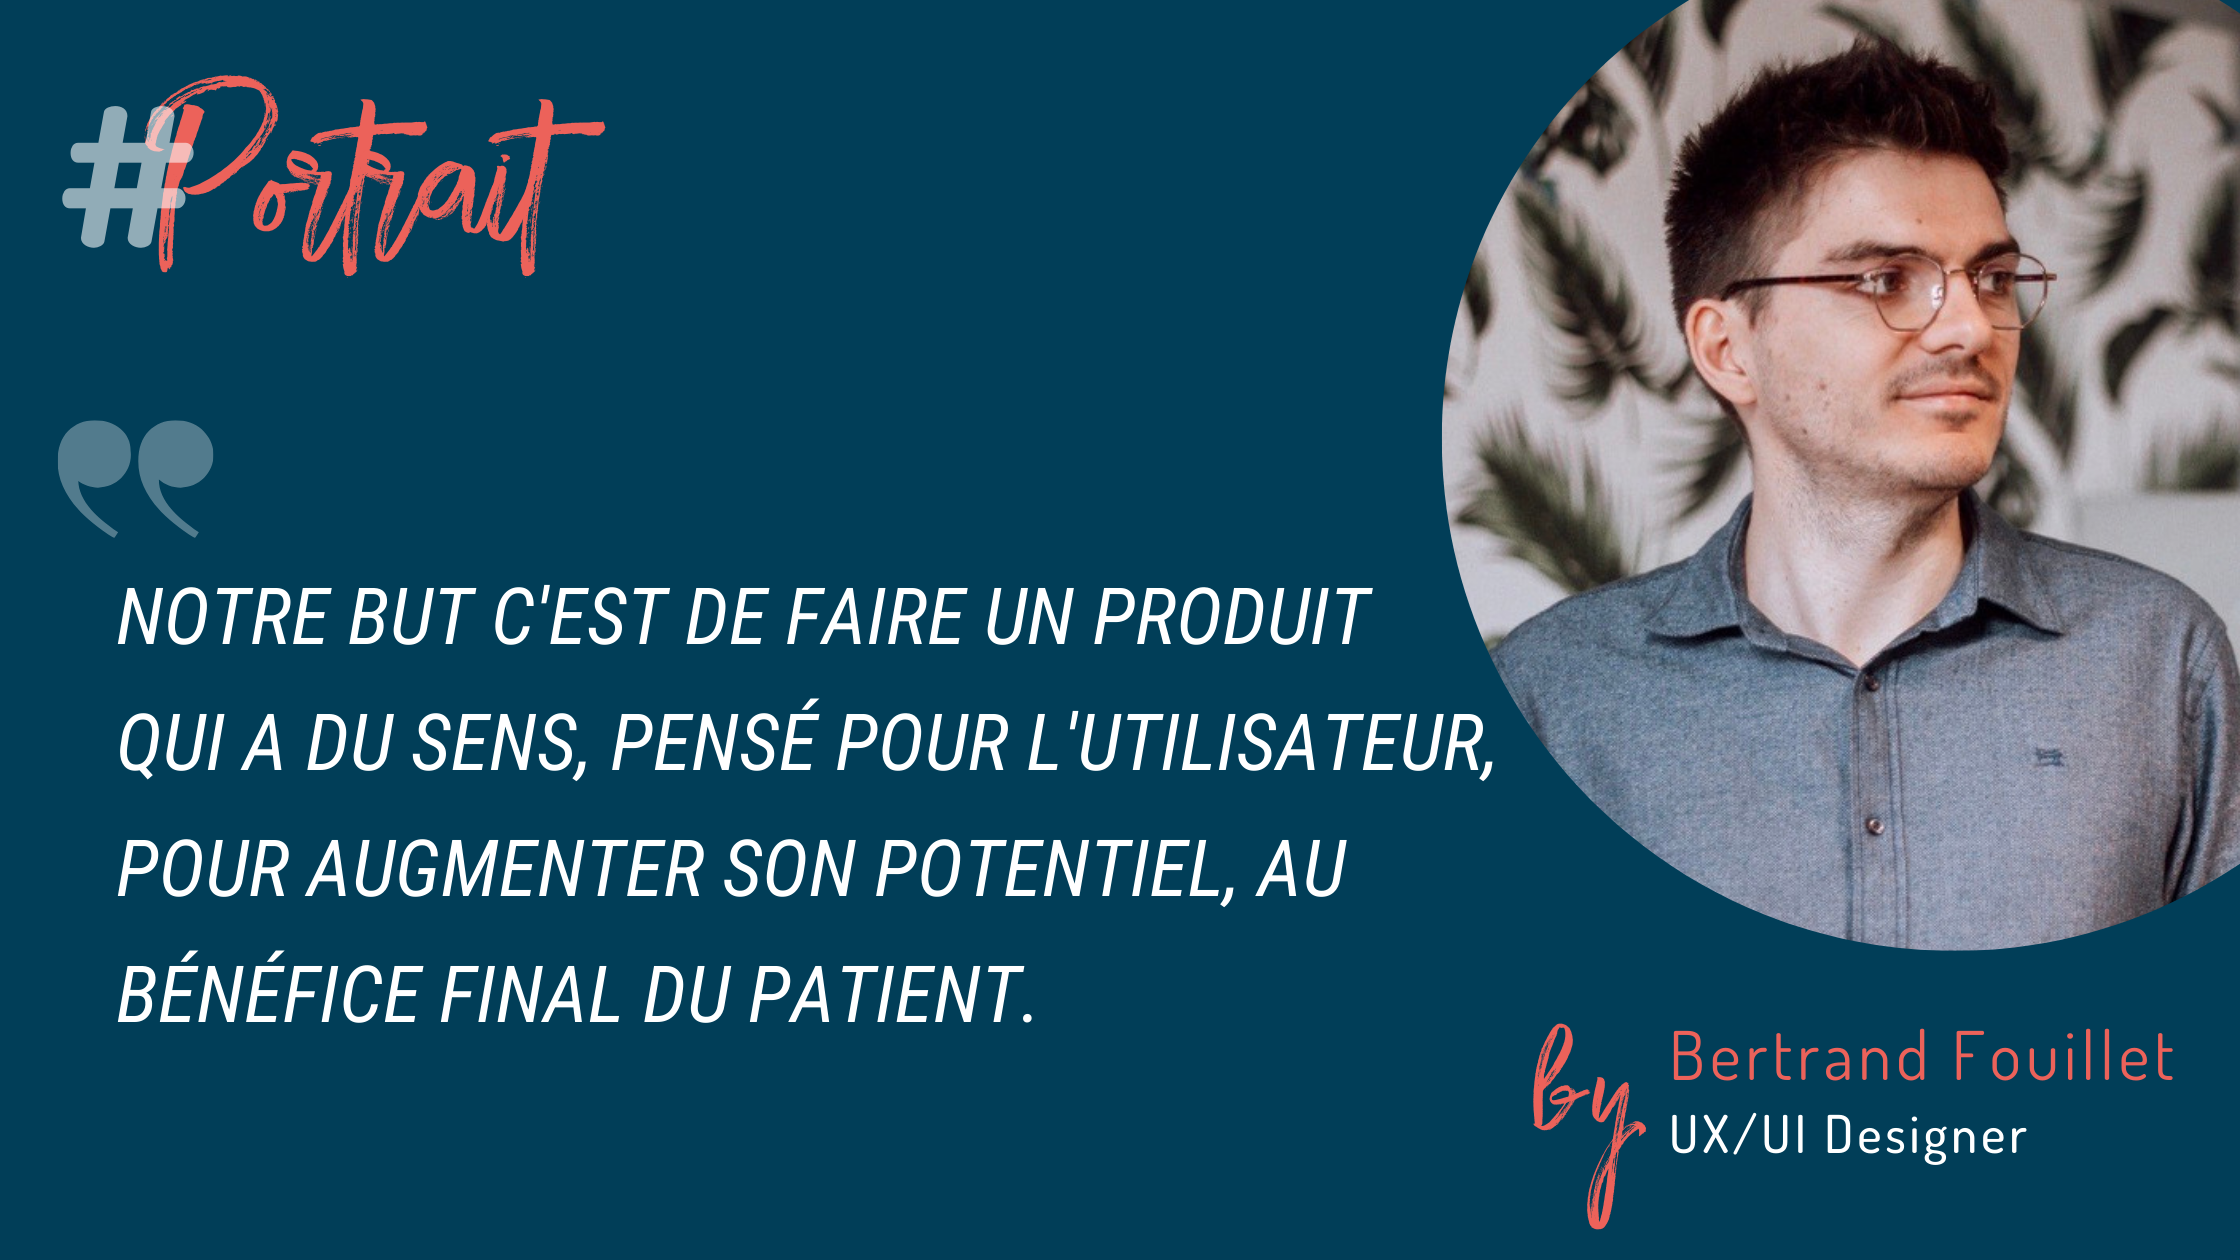 Bertrand Fouillet, UX/UI Designer